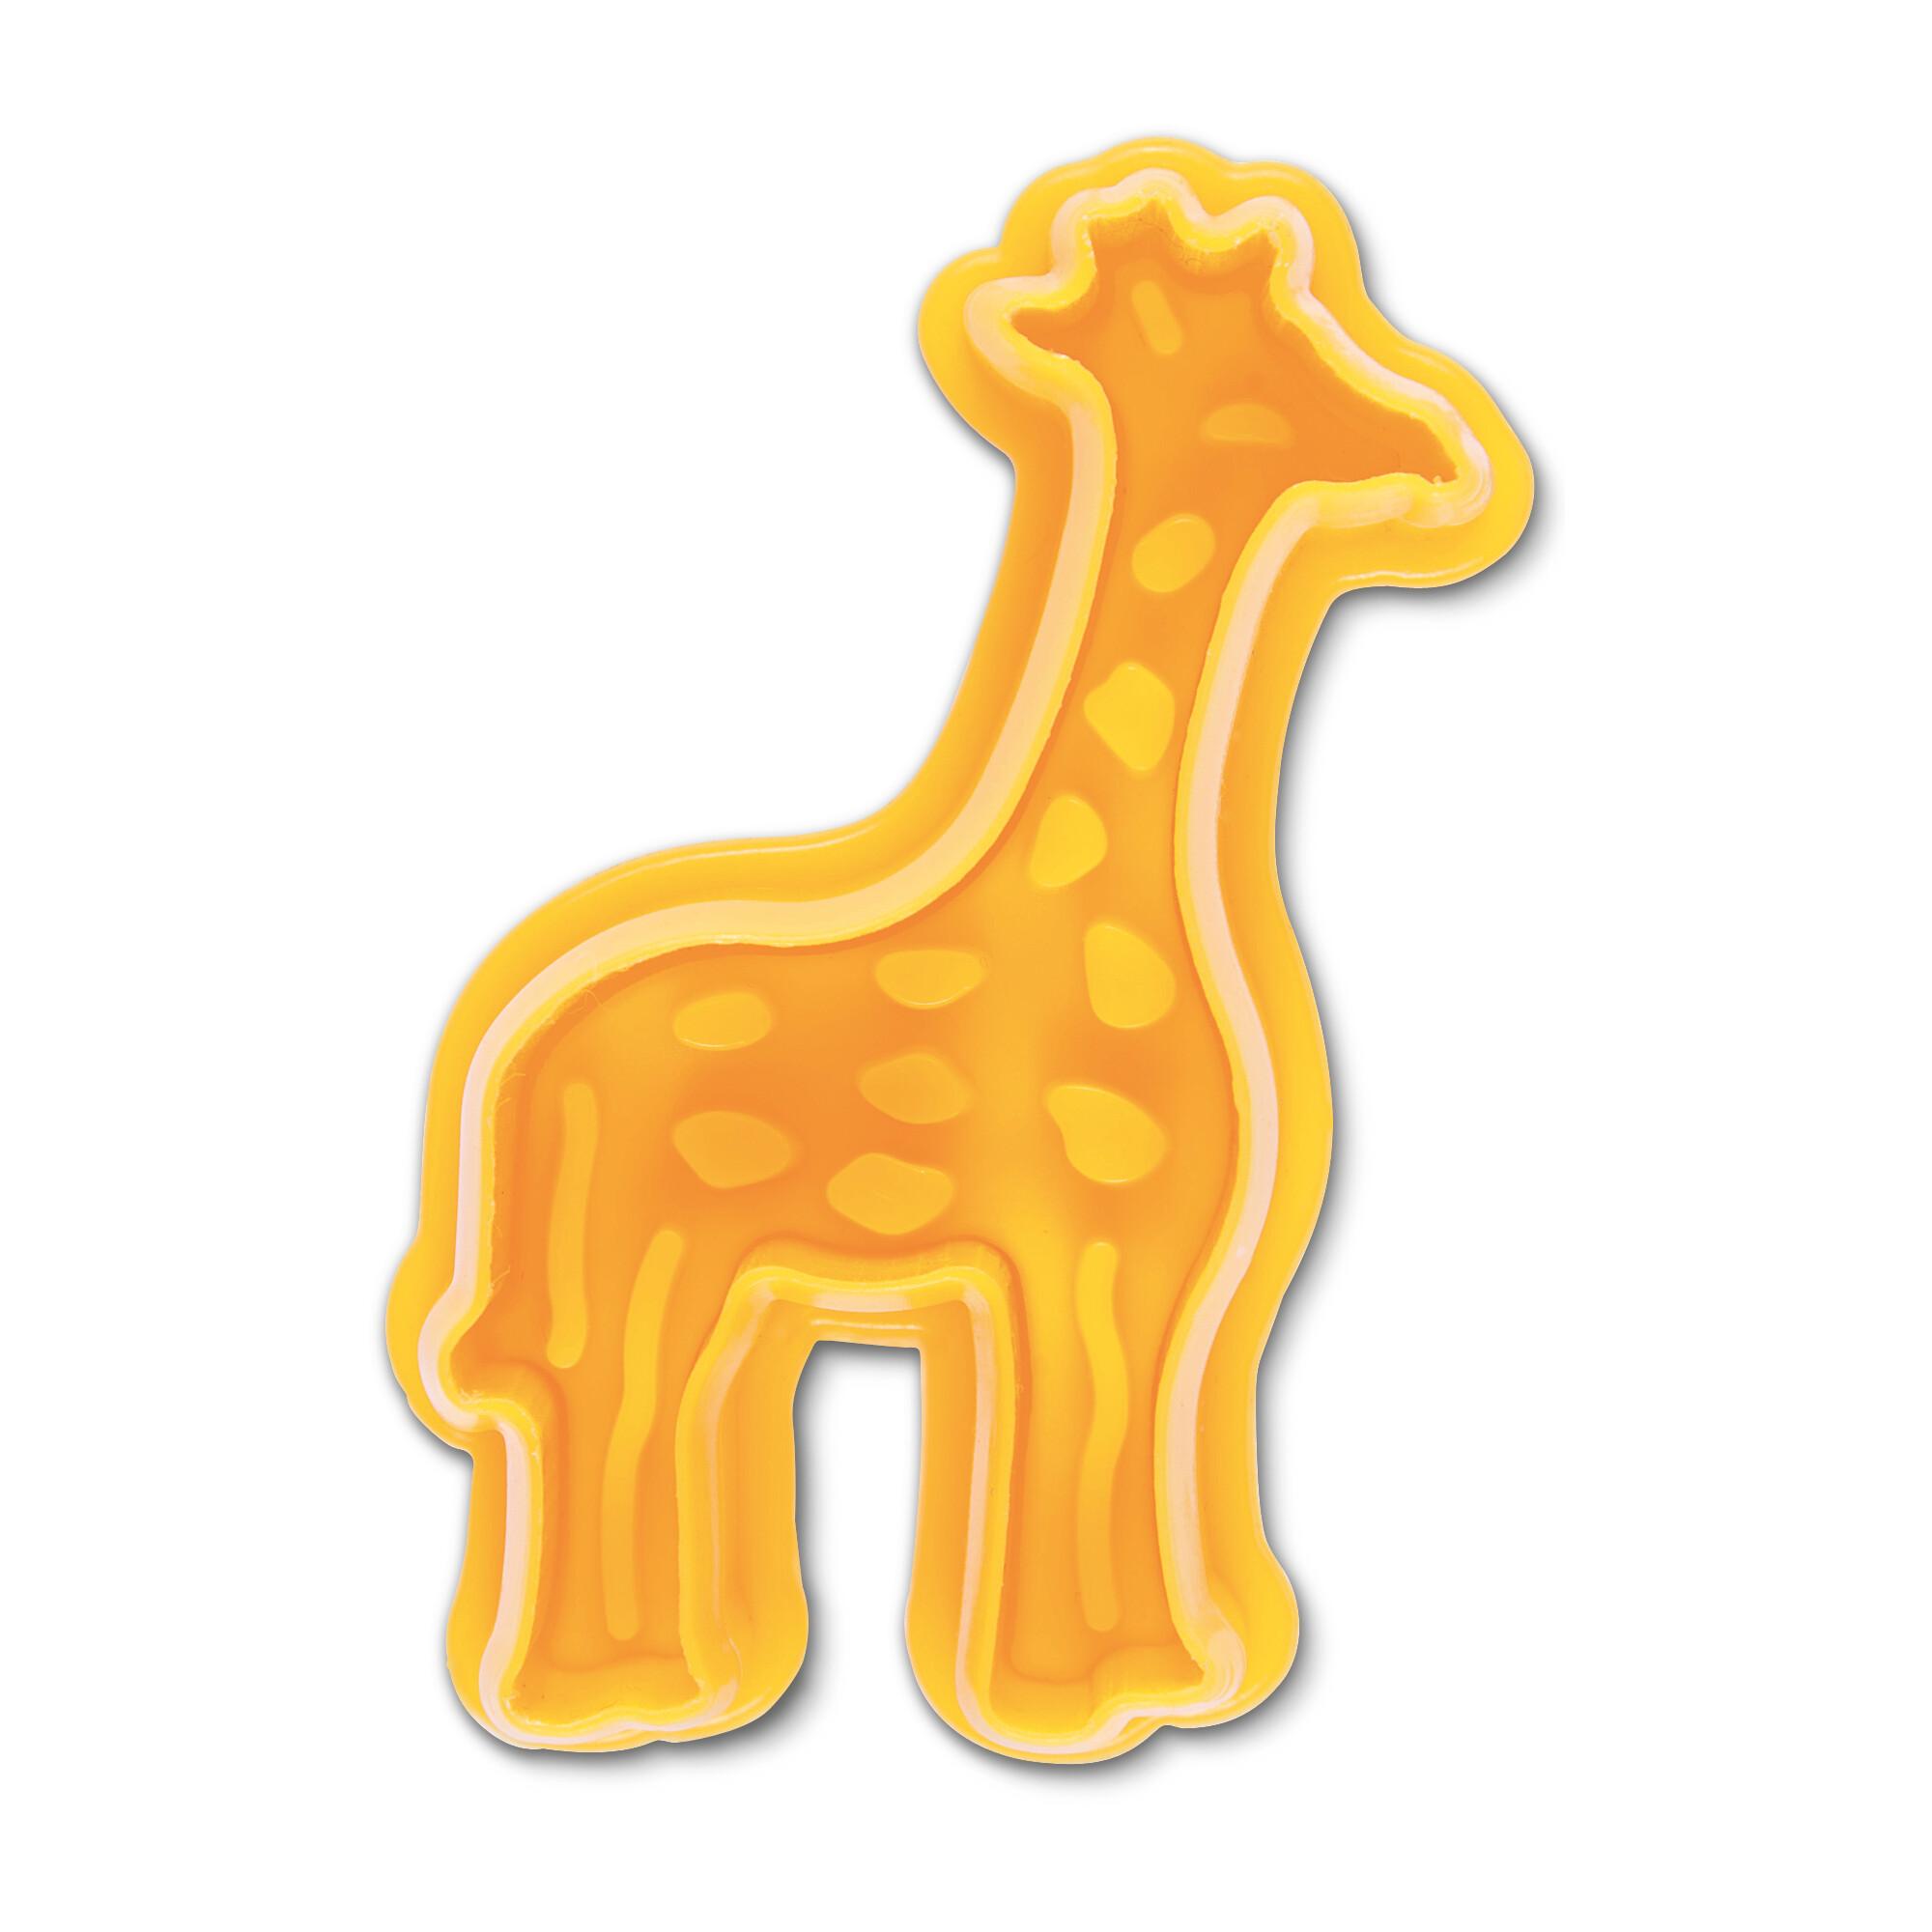 Präge-Ausstecher mit Auswerfer - Giraffe